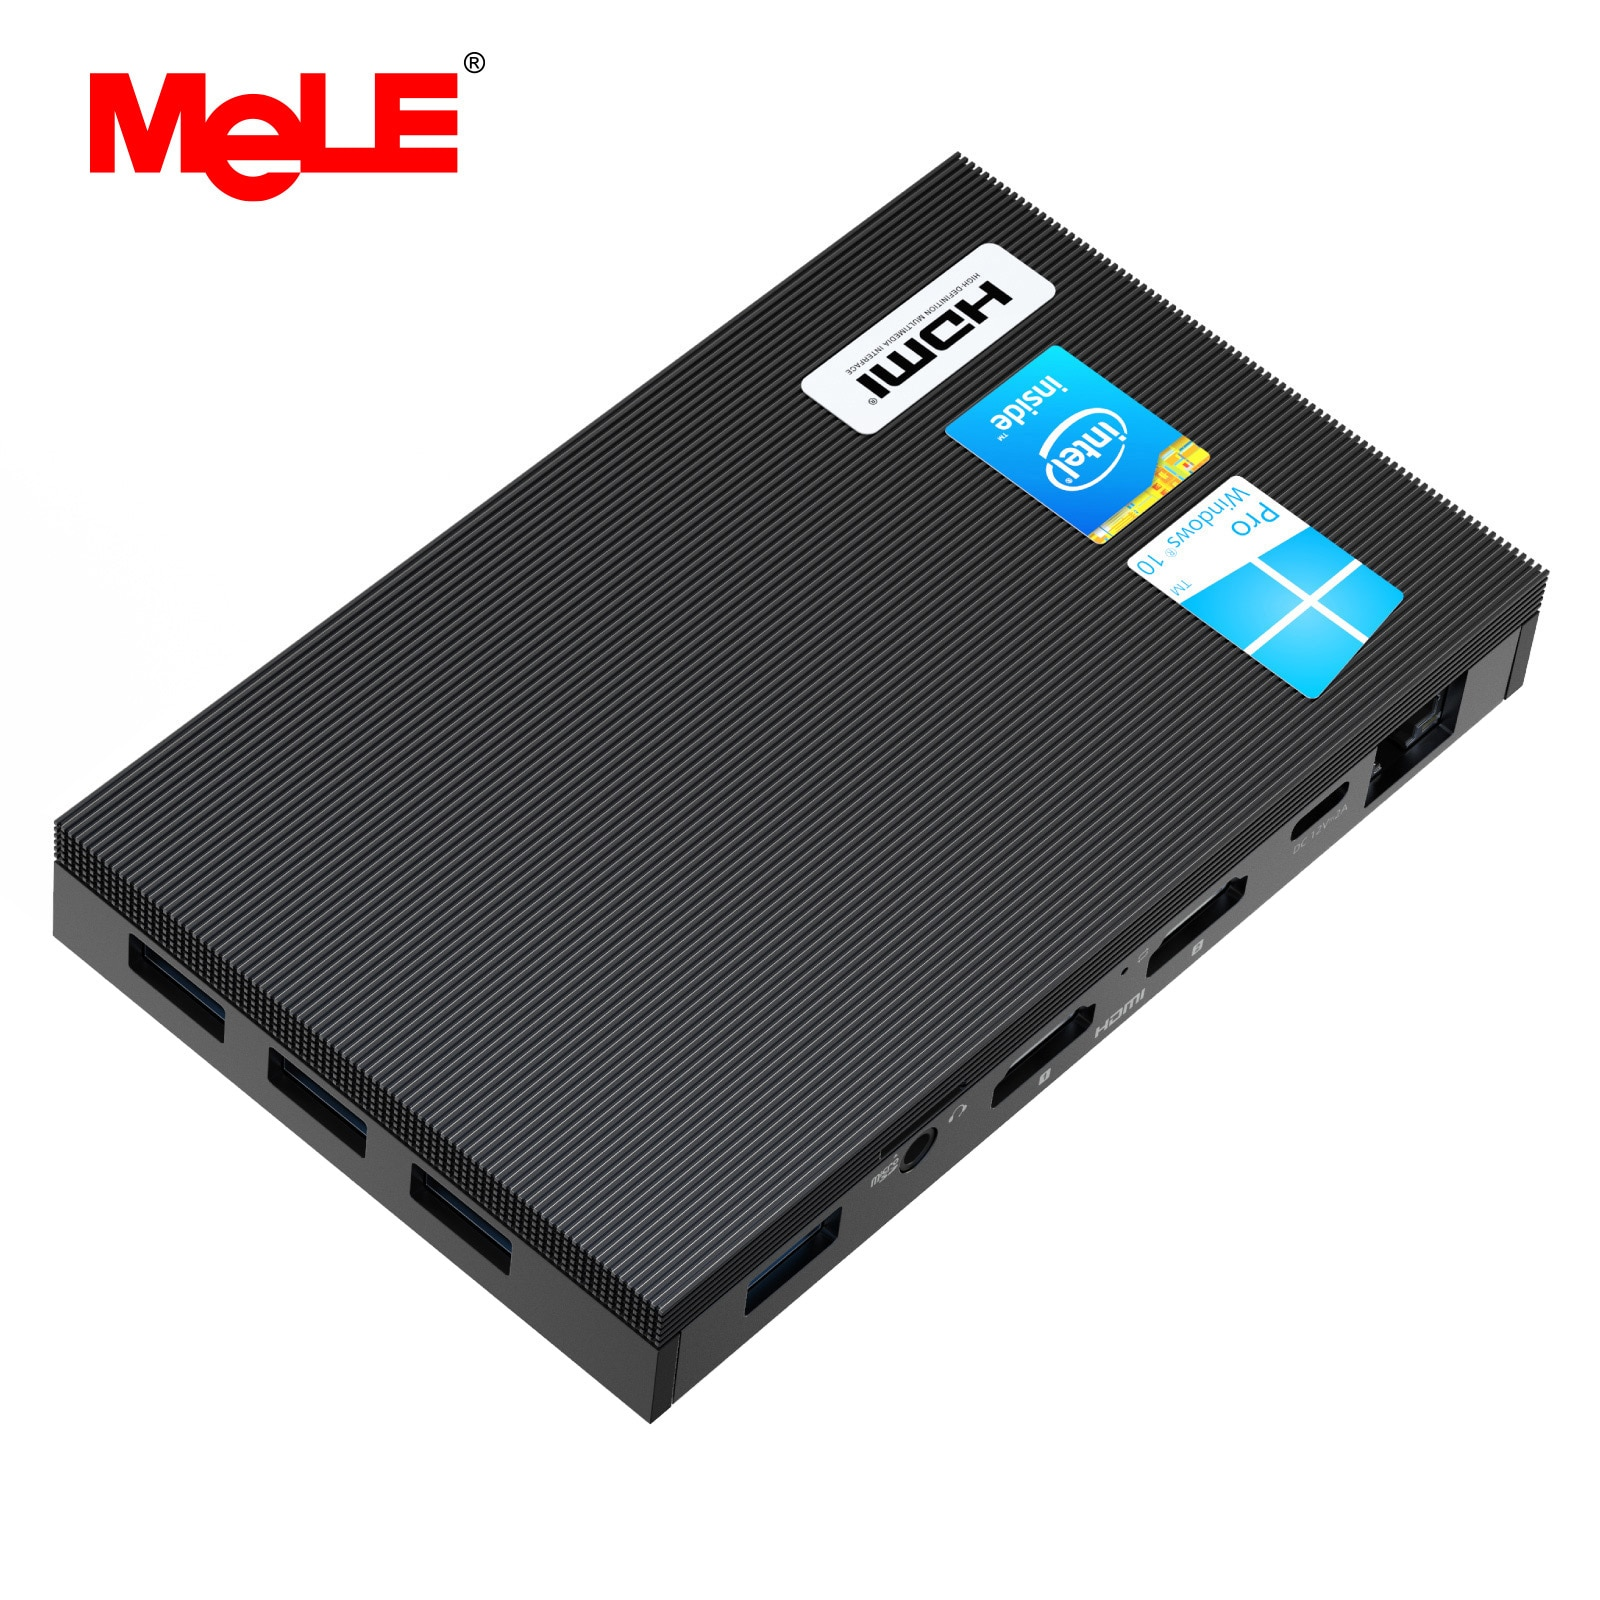 MeLE Fanless 4K Mini PC Intel Celeron J4125 Quad Core 8GB 128GB Windows 10 Desktop Computer Dual HDMI 2.4G/5G Dual-band WiFi SSD